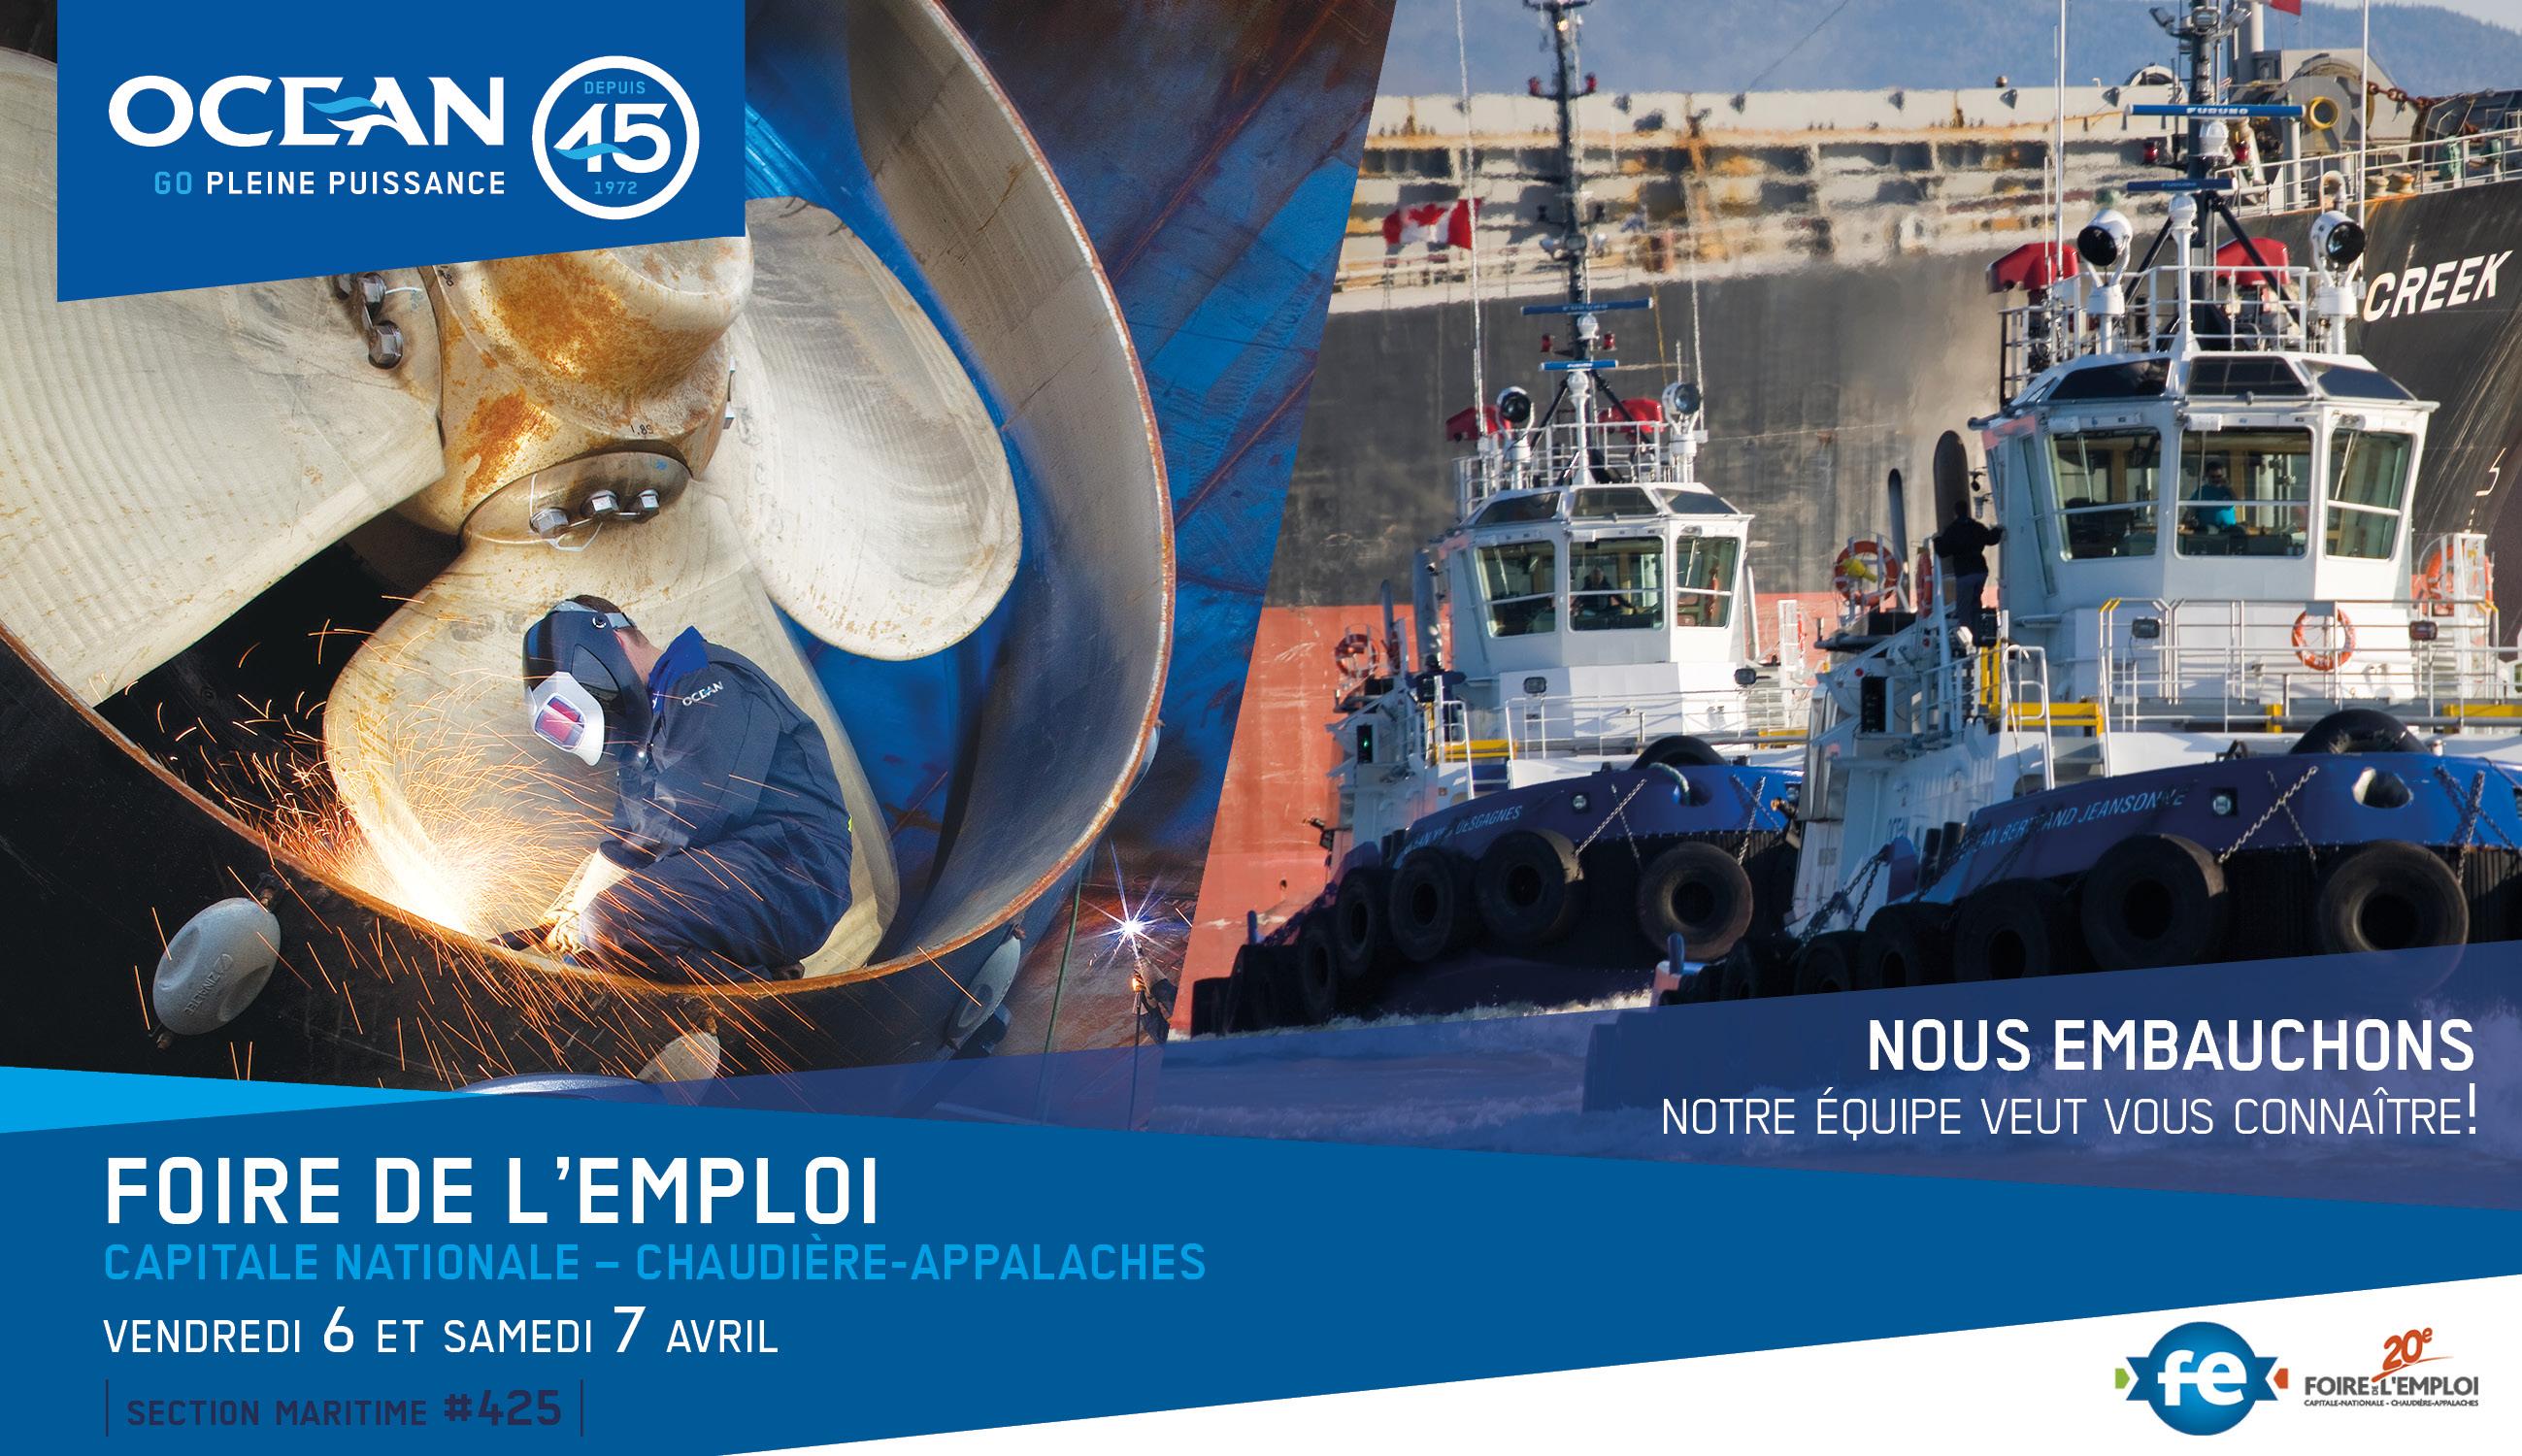 Job fair - Capitale Nationale and Chaudière-Appalaches